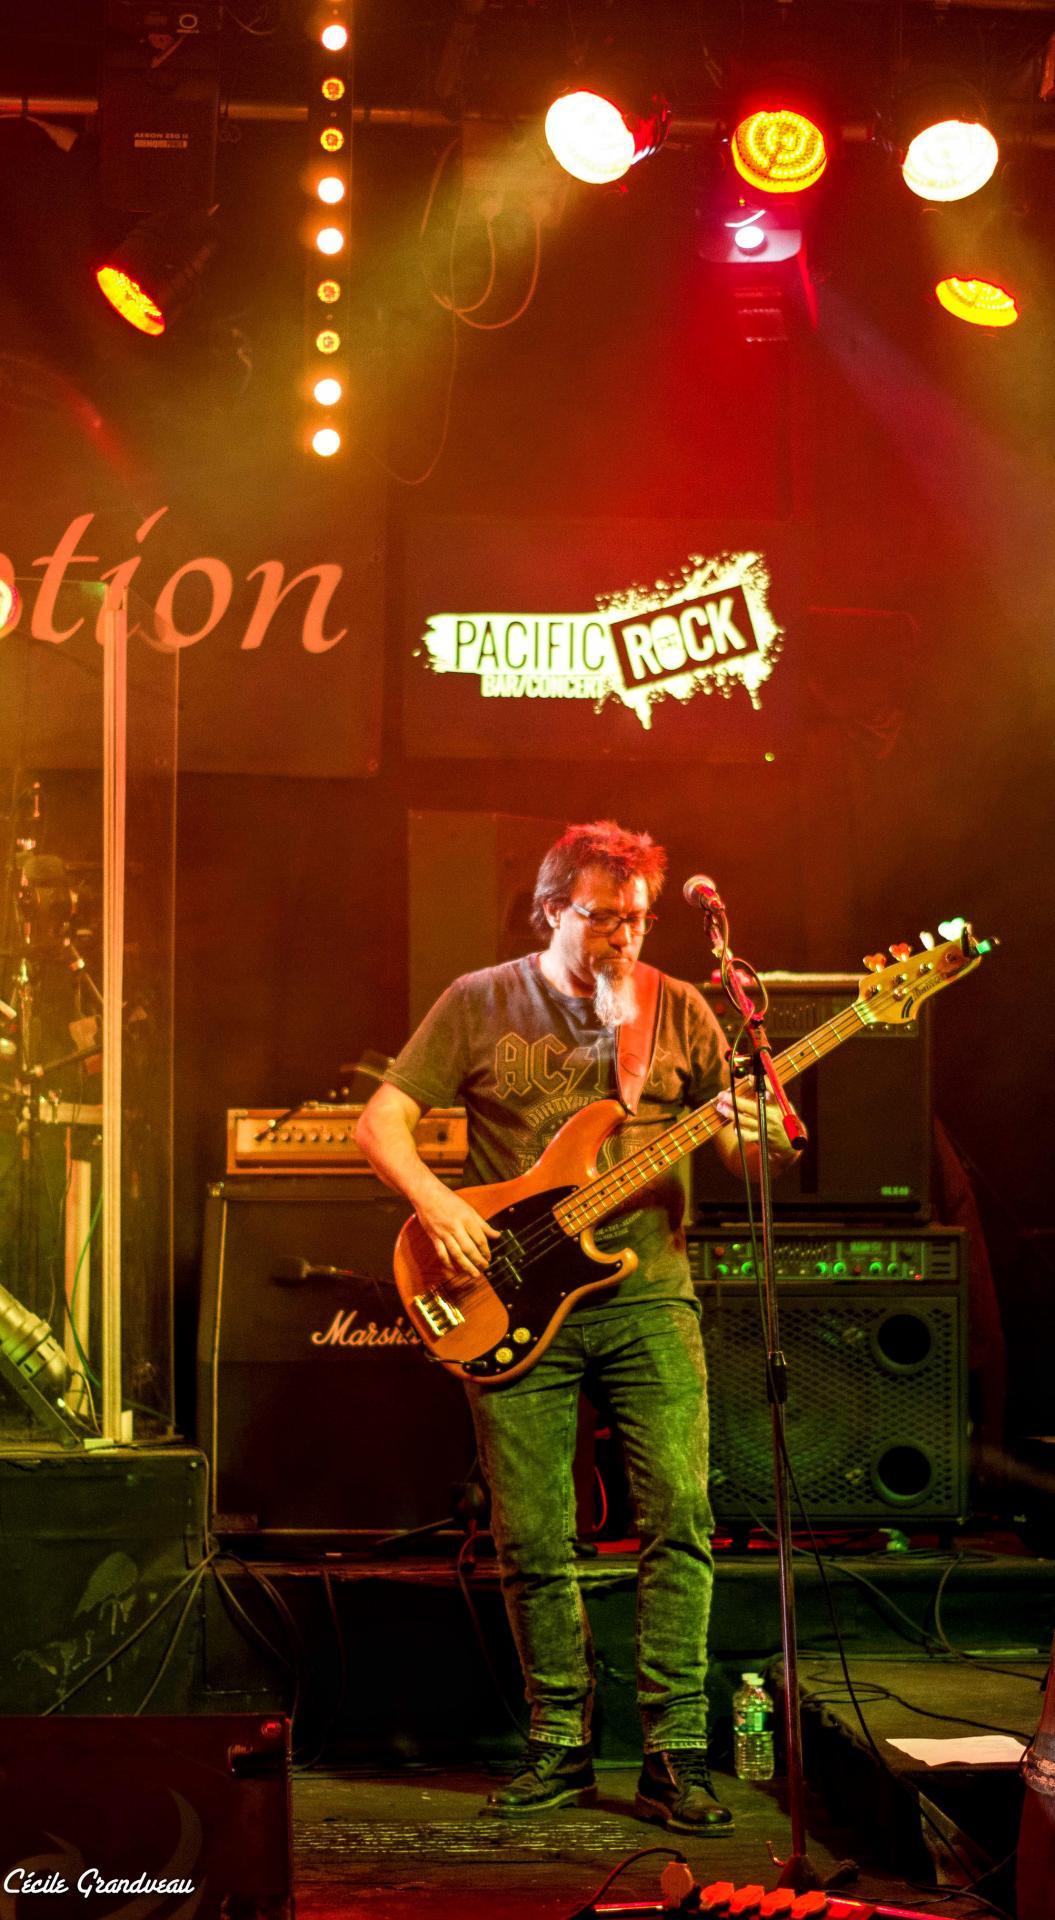 Resumption - Pacific Rock - mars 2019